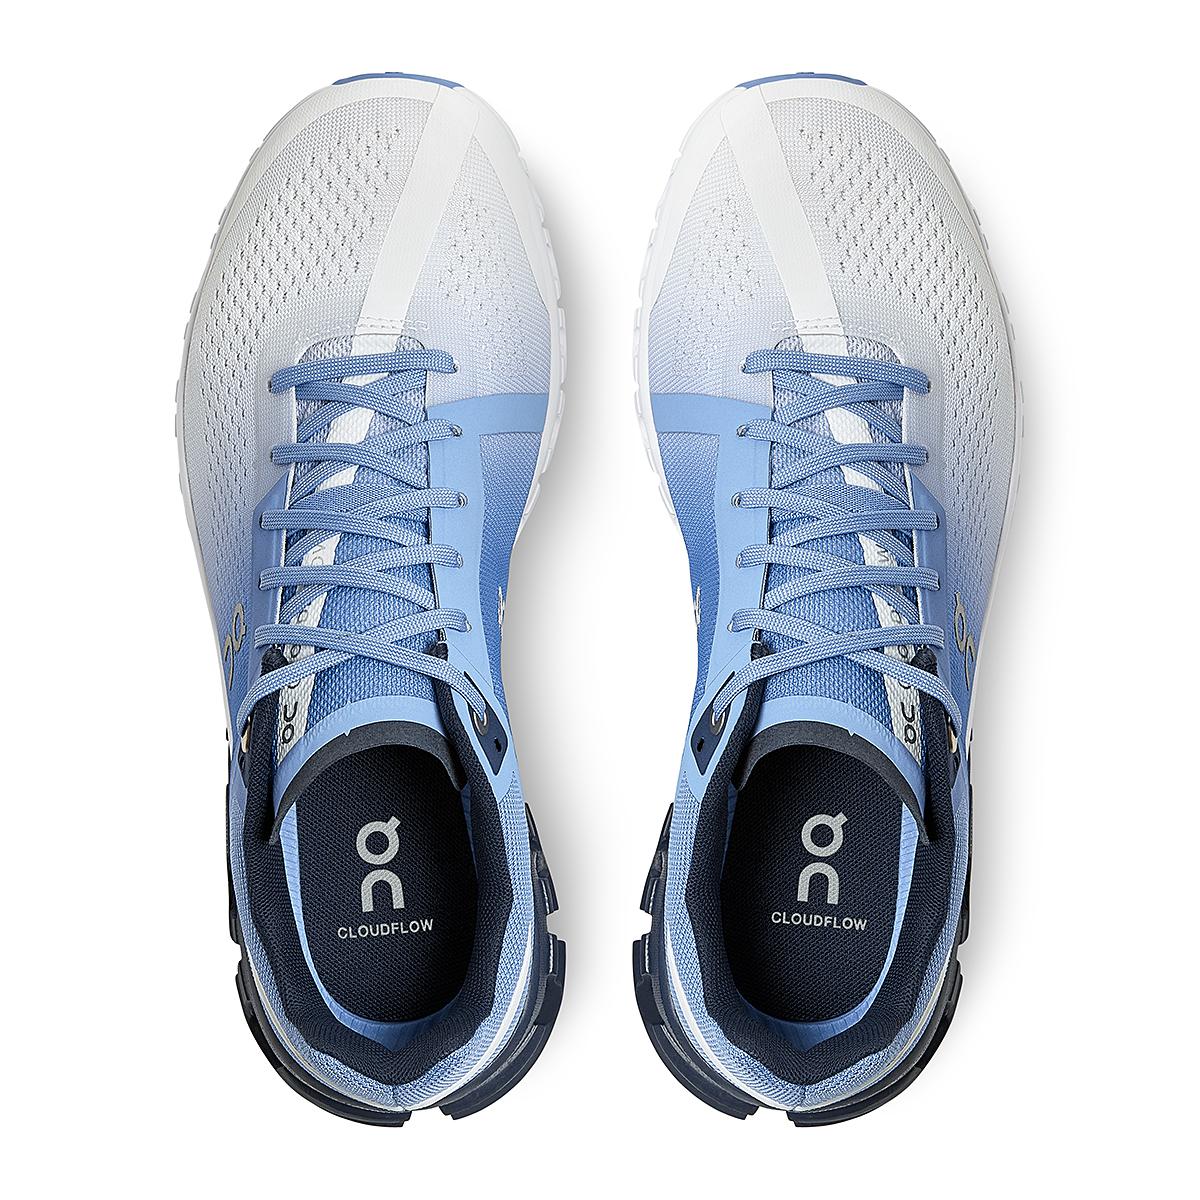 Women's On Cloudflow 3.0 Running Shoe - Color: Marina/White - Size: 5 - Width: Regular, Marina/White, large, image 4